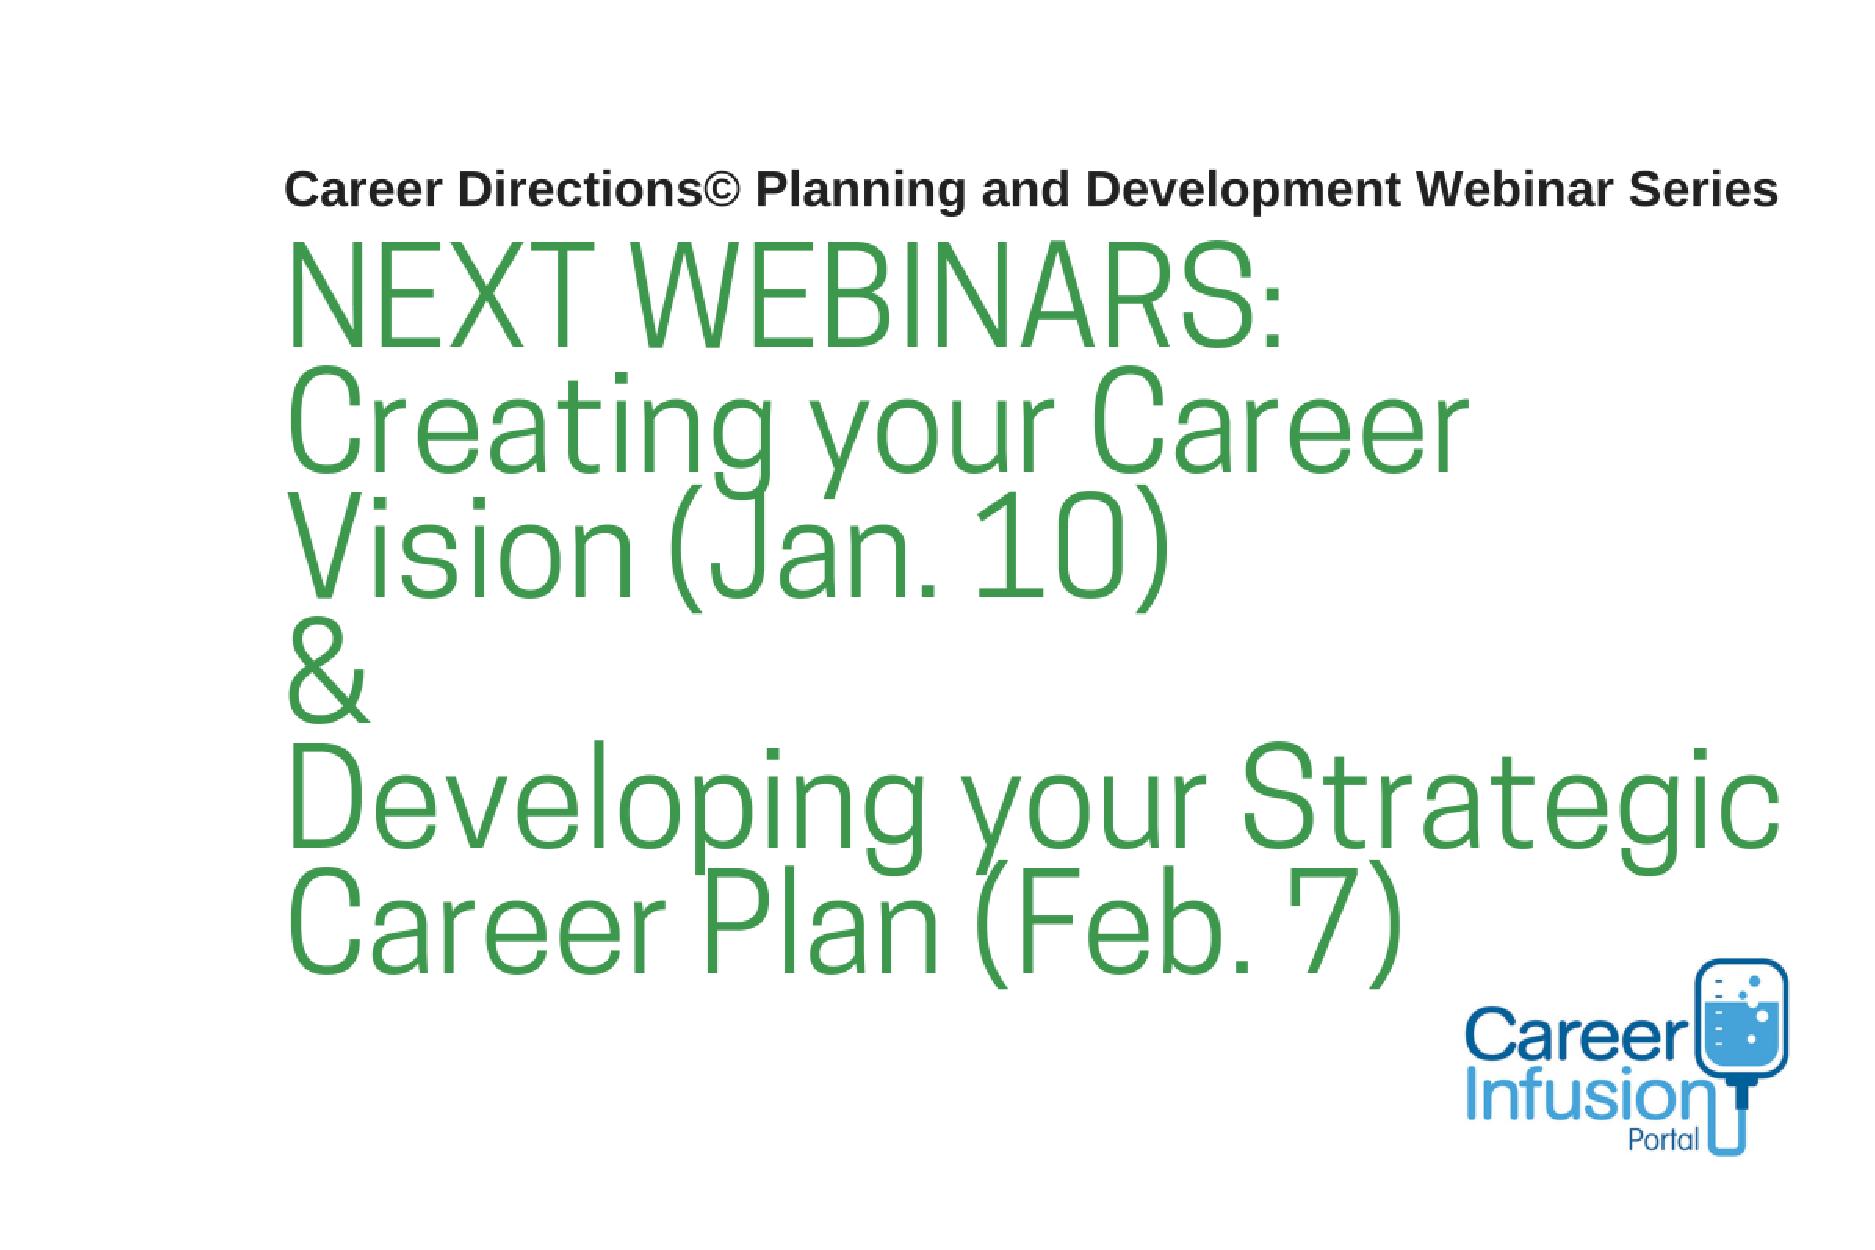 ad_webinar_careerdirections4-5_visioning_planning